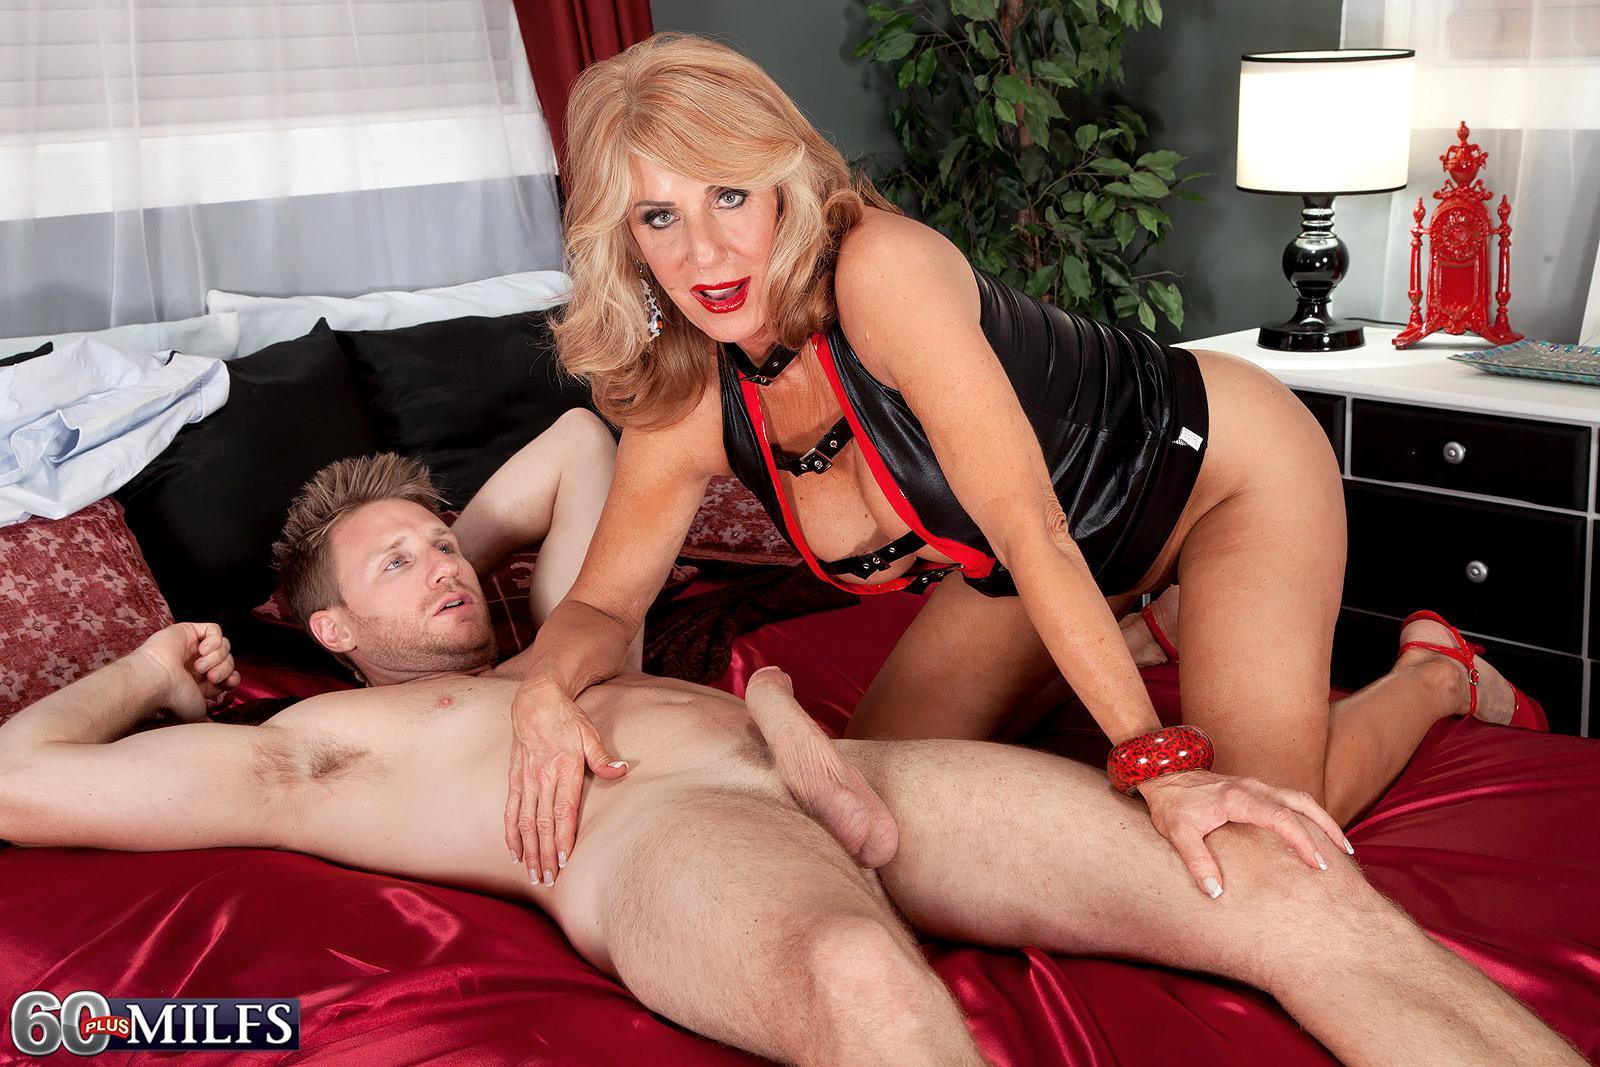 Long-limbed yellow-haired grandma Phoenix Skye giving massive boner handjob and oral pleasure in high-heels